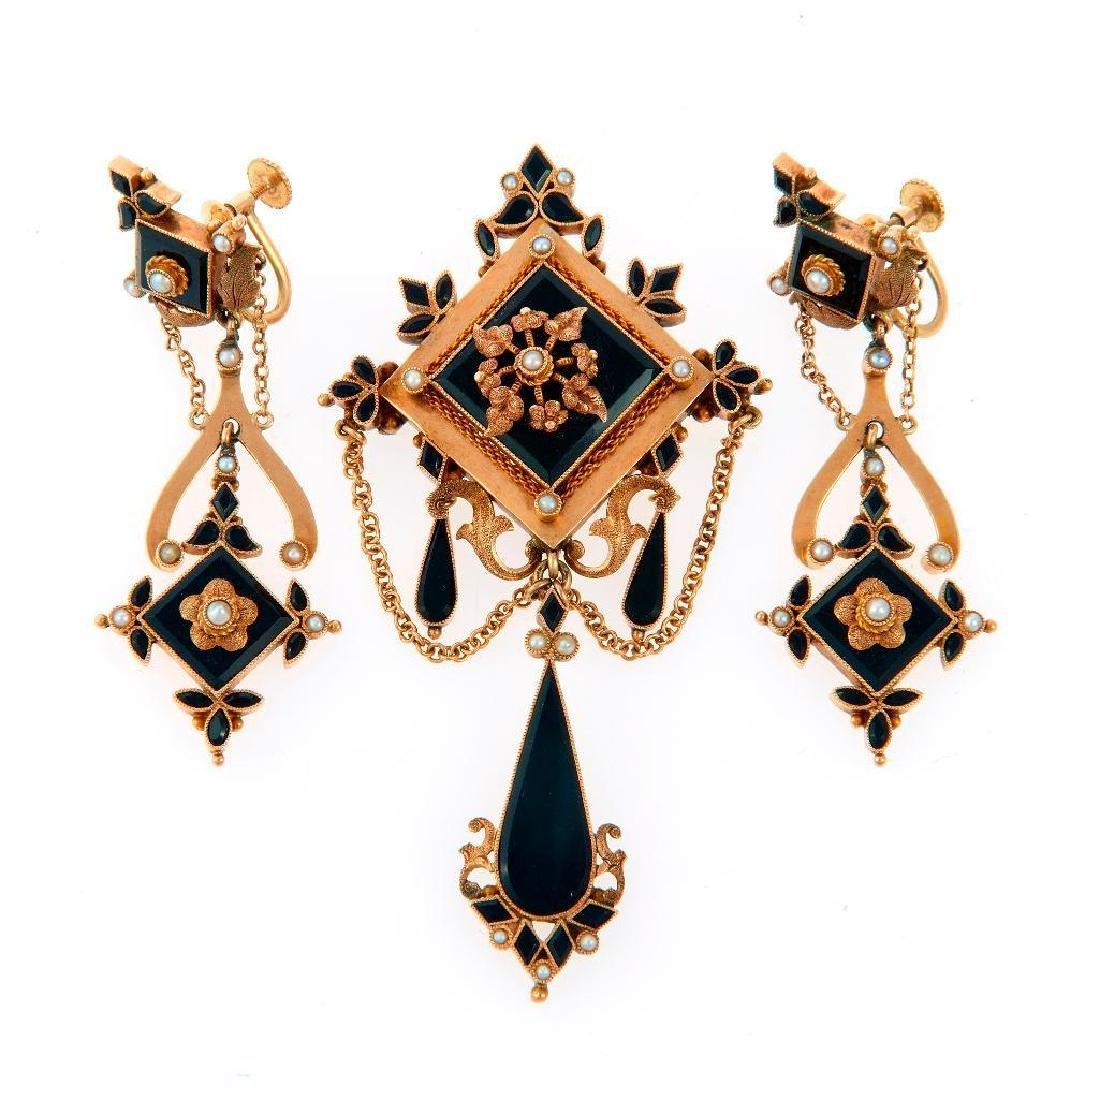 Victorian onyx, seed pearl, 14k gold brooch/earring set